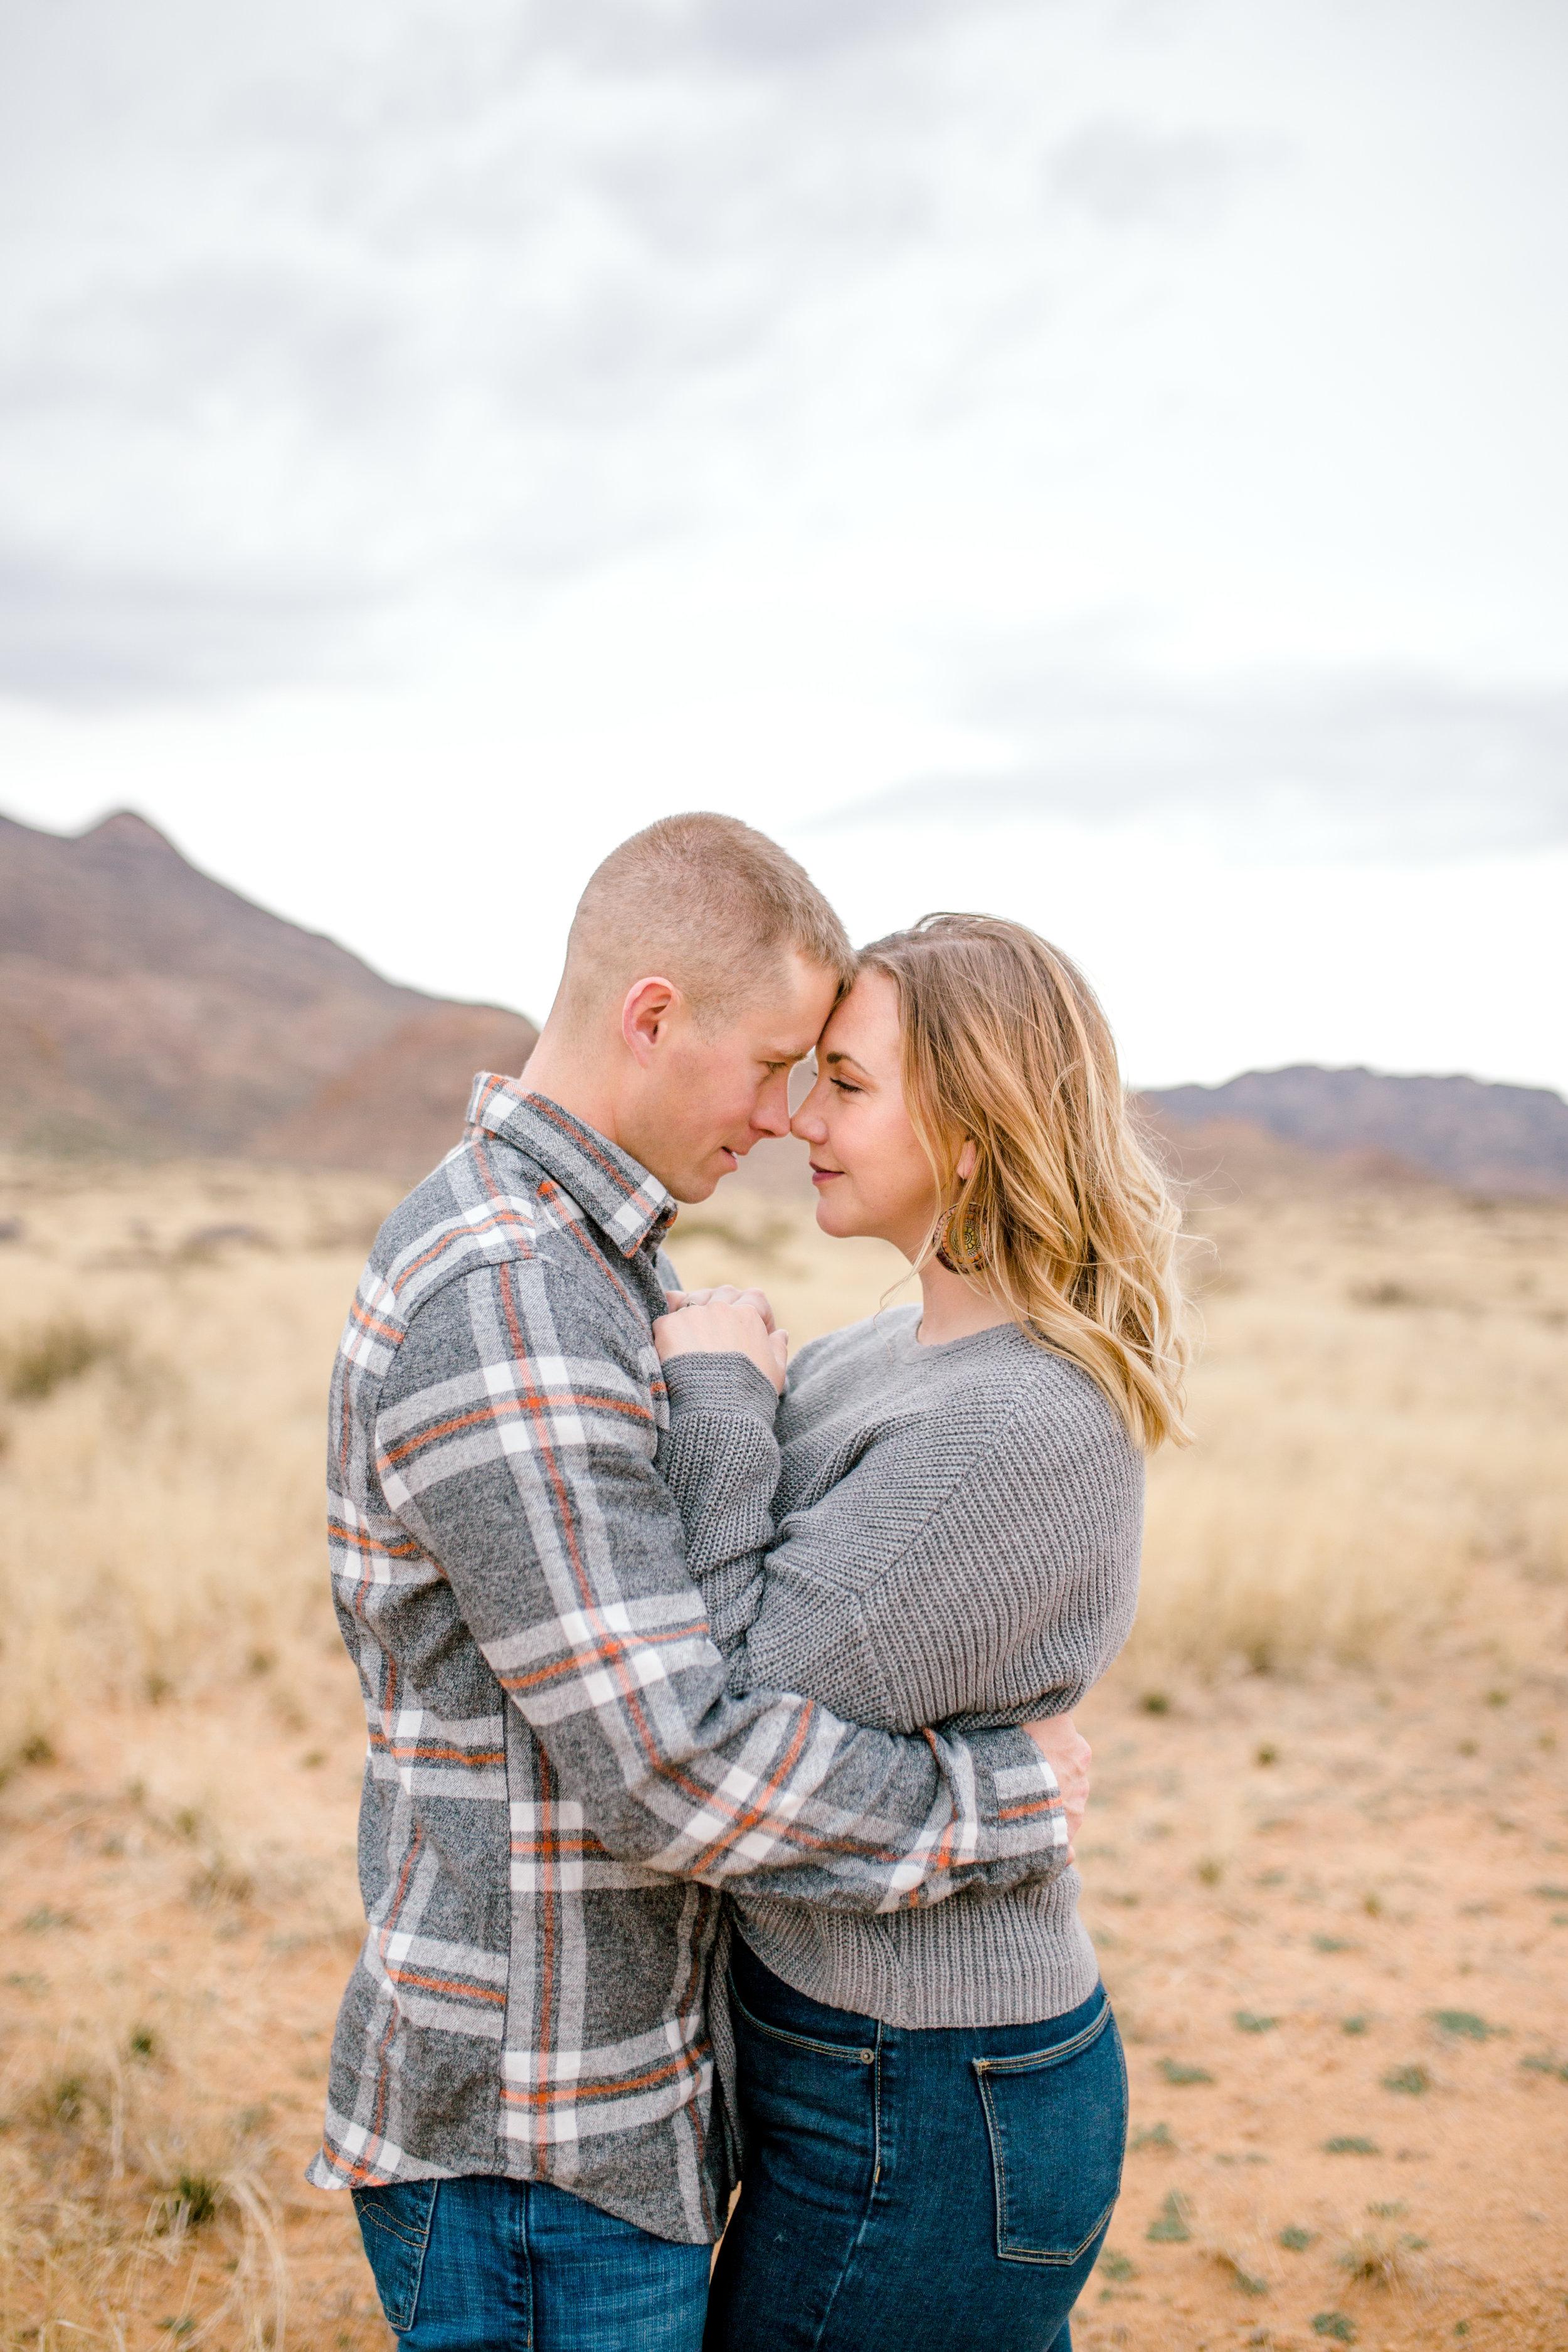 couples-franklin-mountains-el-paso-photographer-21